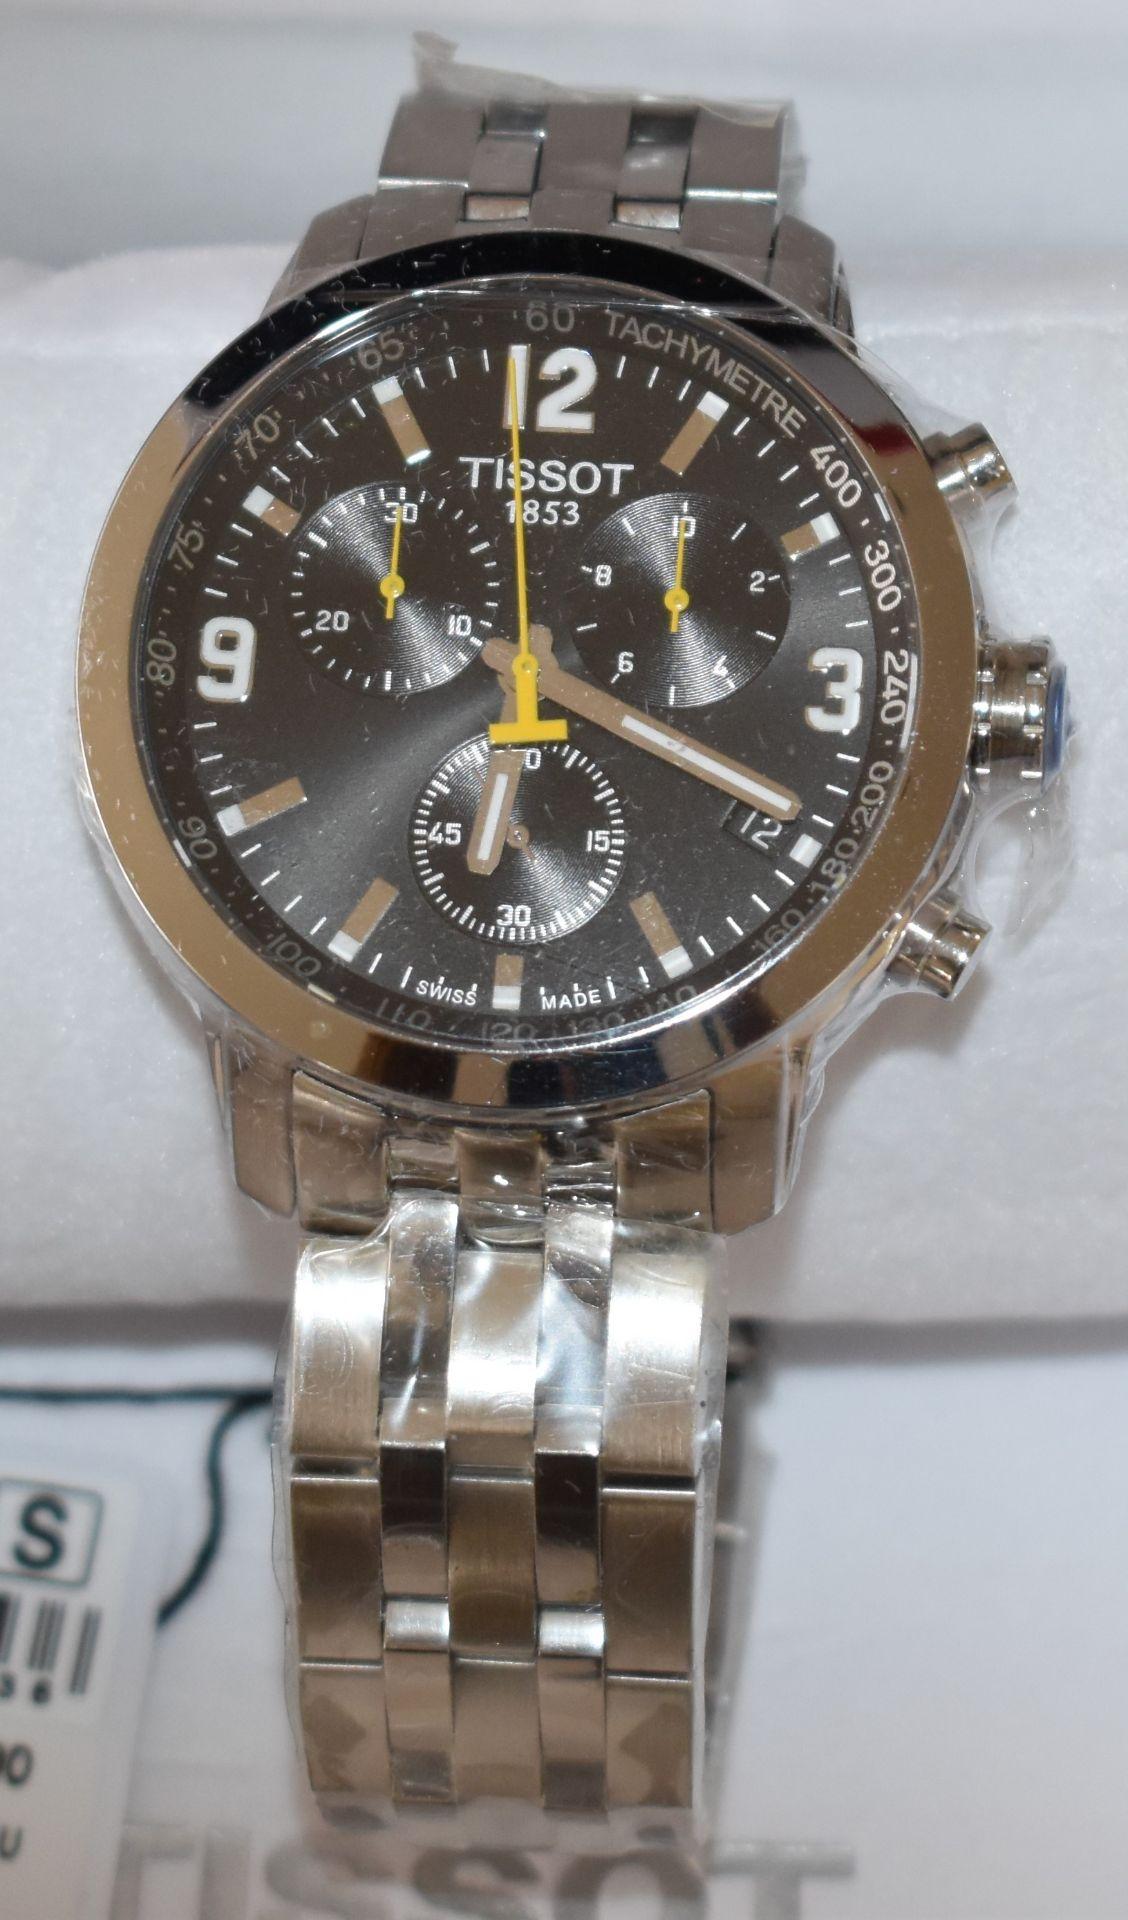 Tissot Men's Watch TO55.417.11.057.00 - Image 2 of 3